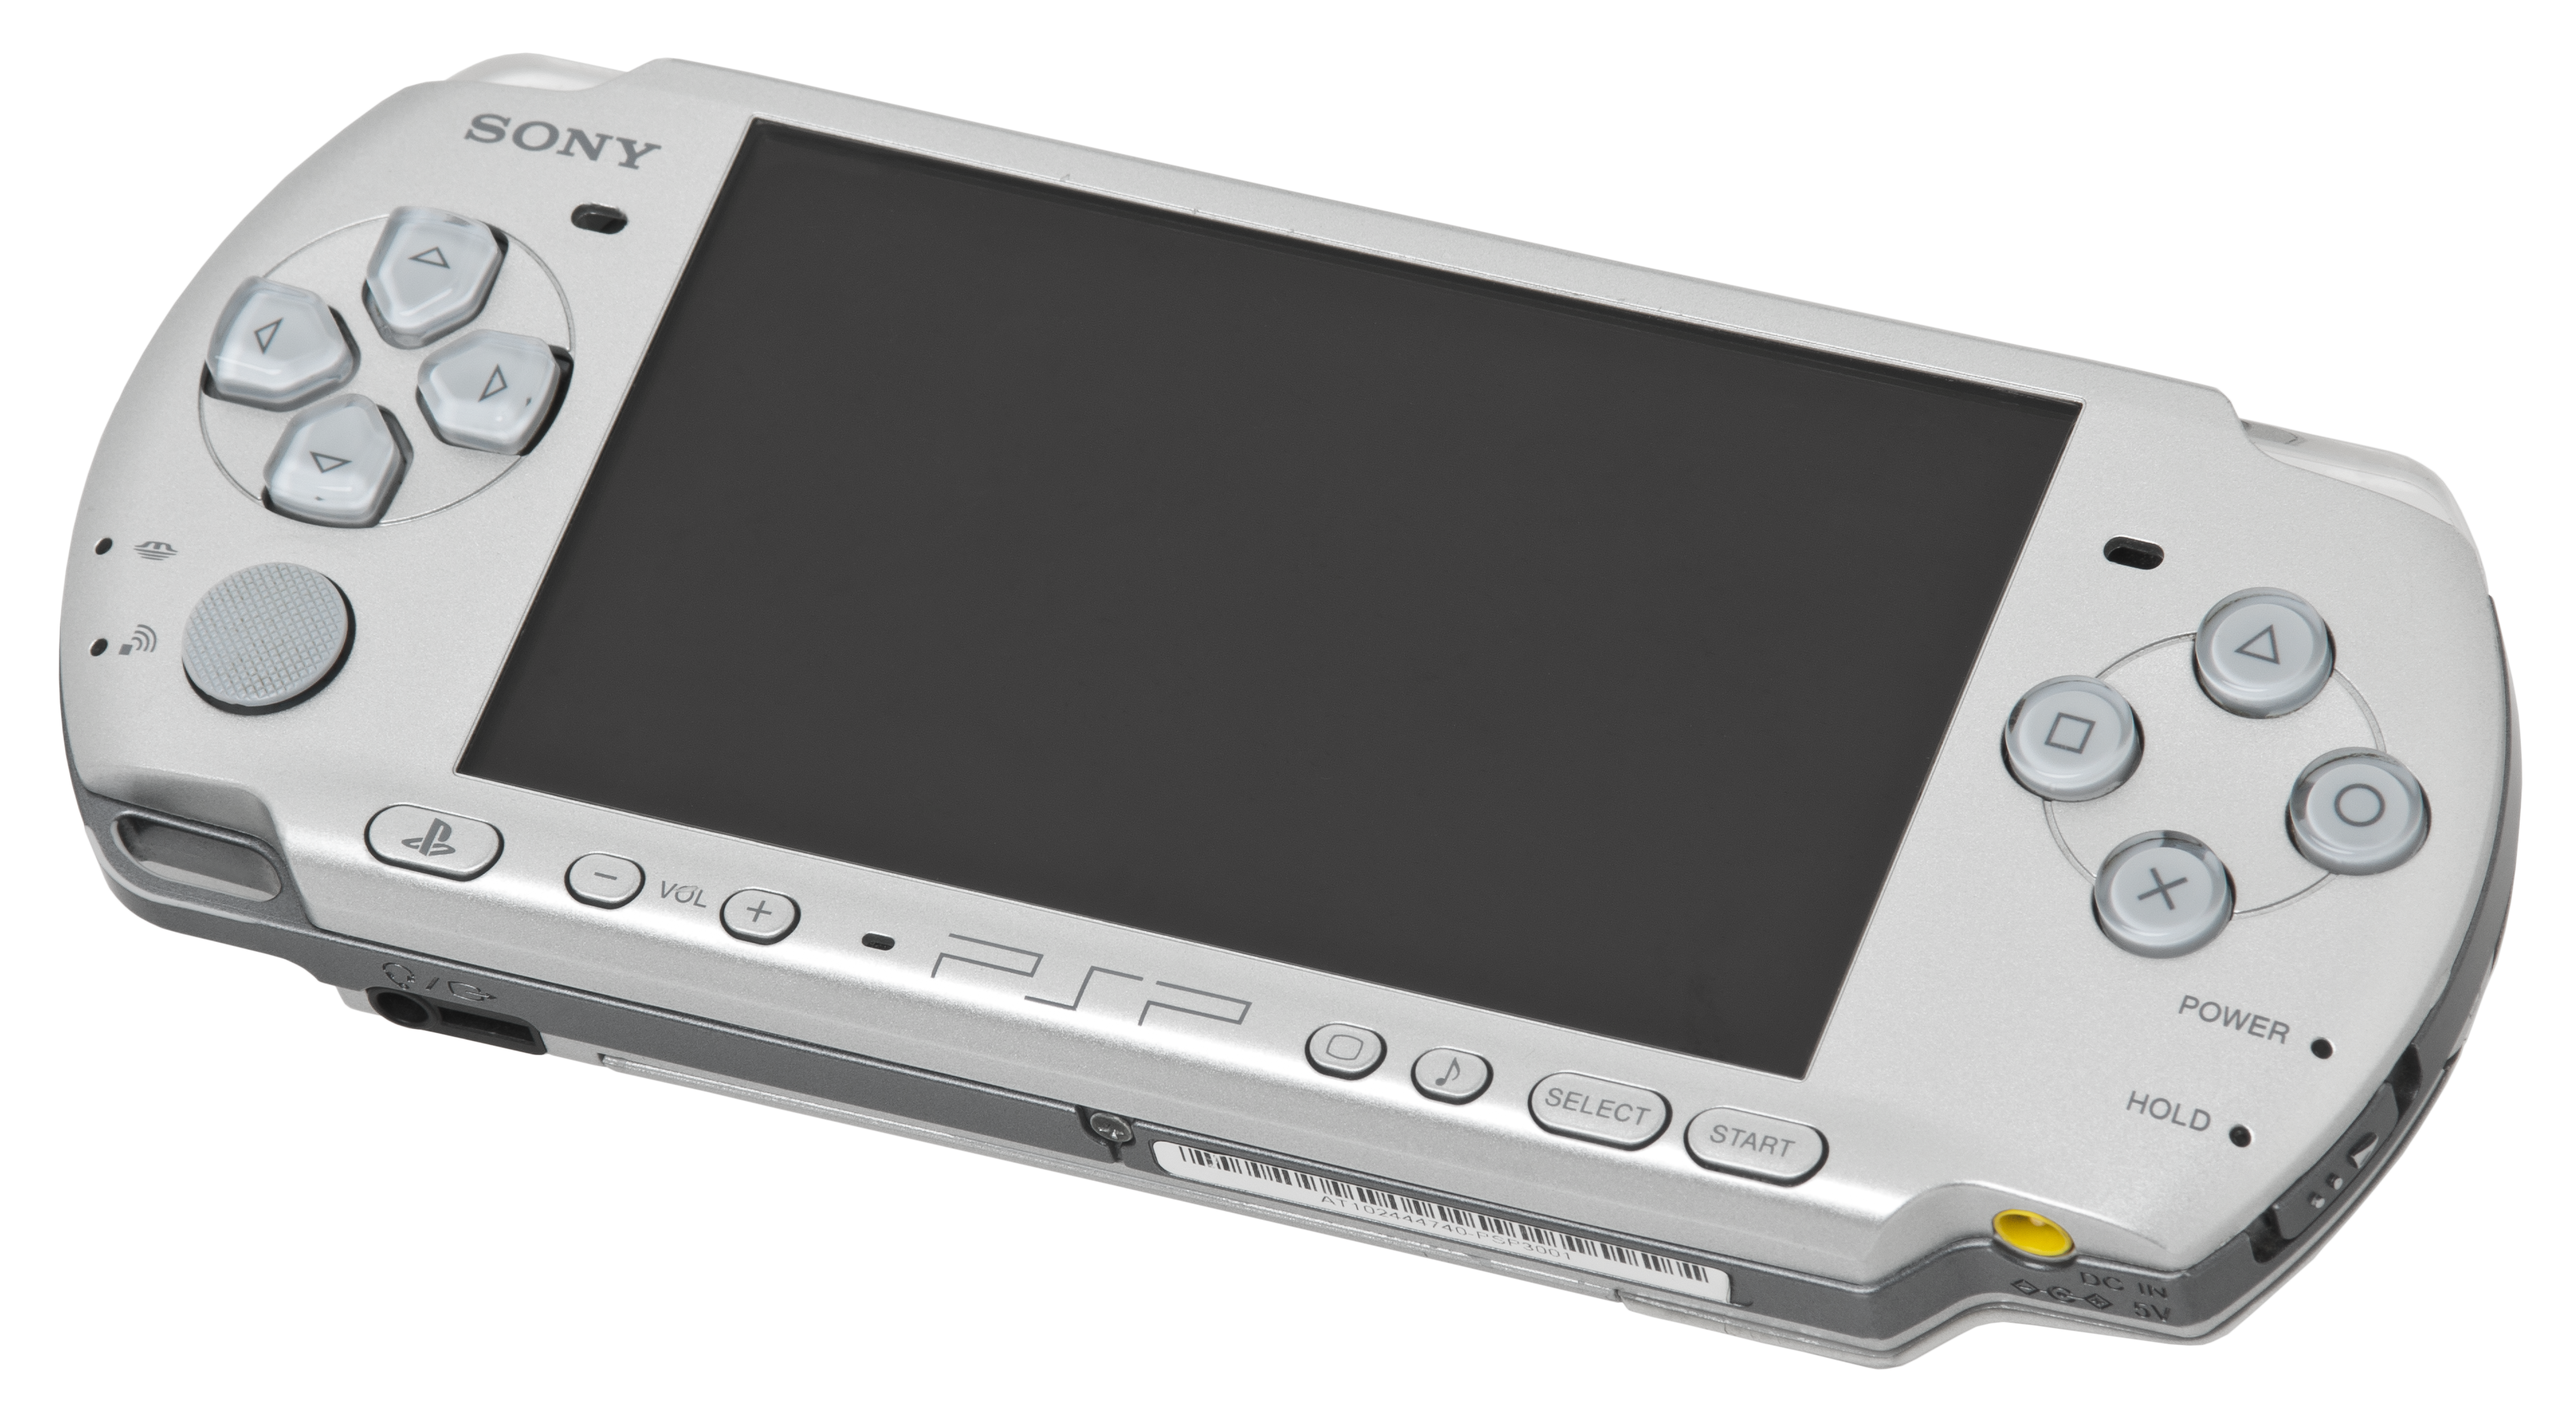 Playstation Portable Wikipedia